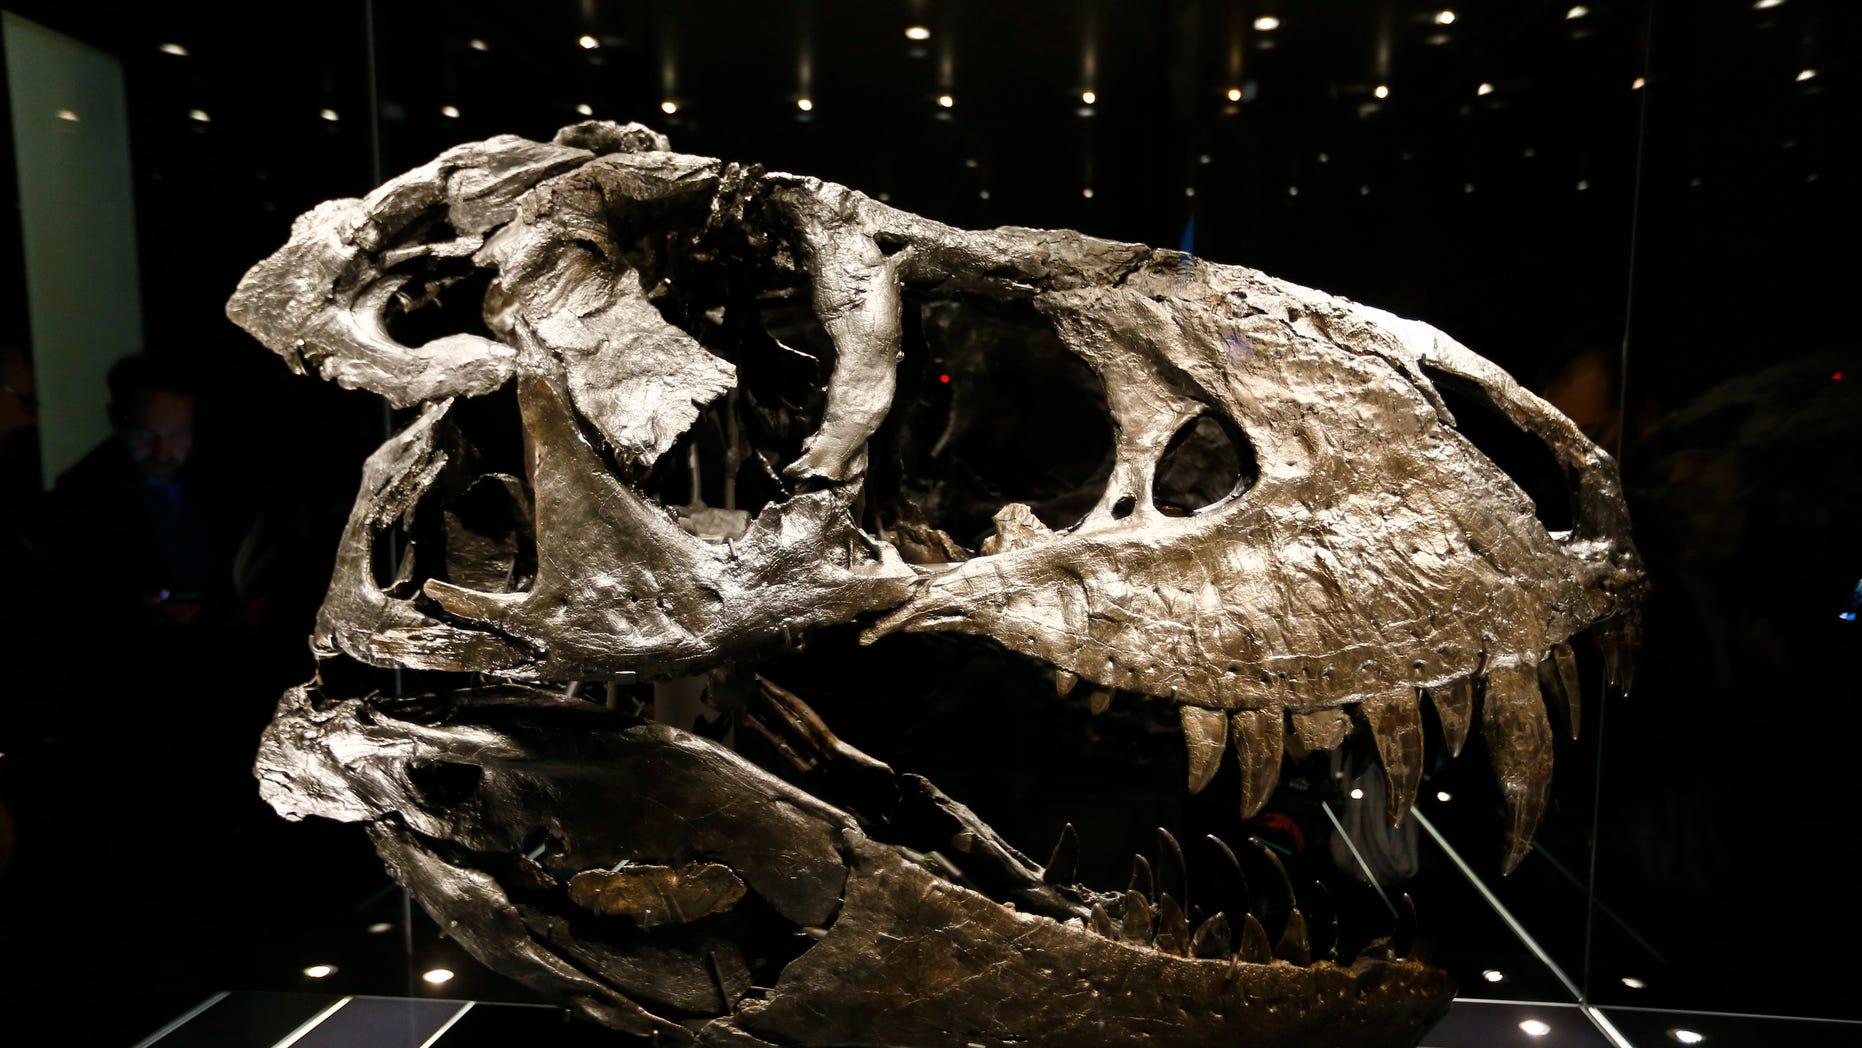 The original skull of a Tyrannosaurus rex skeleton is shown at the Natural History Museum in Berlin, Germany December 16, 2015. (REUTERS/Pawel Kopczynski)